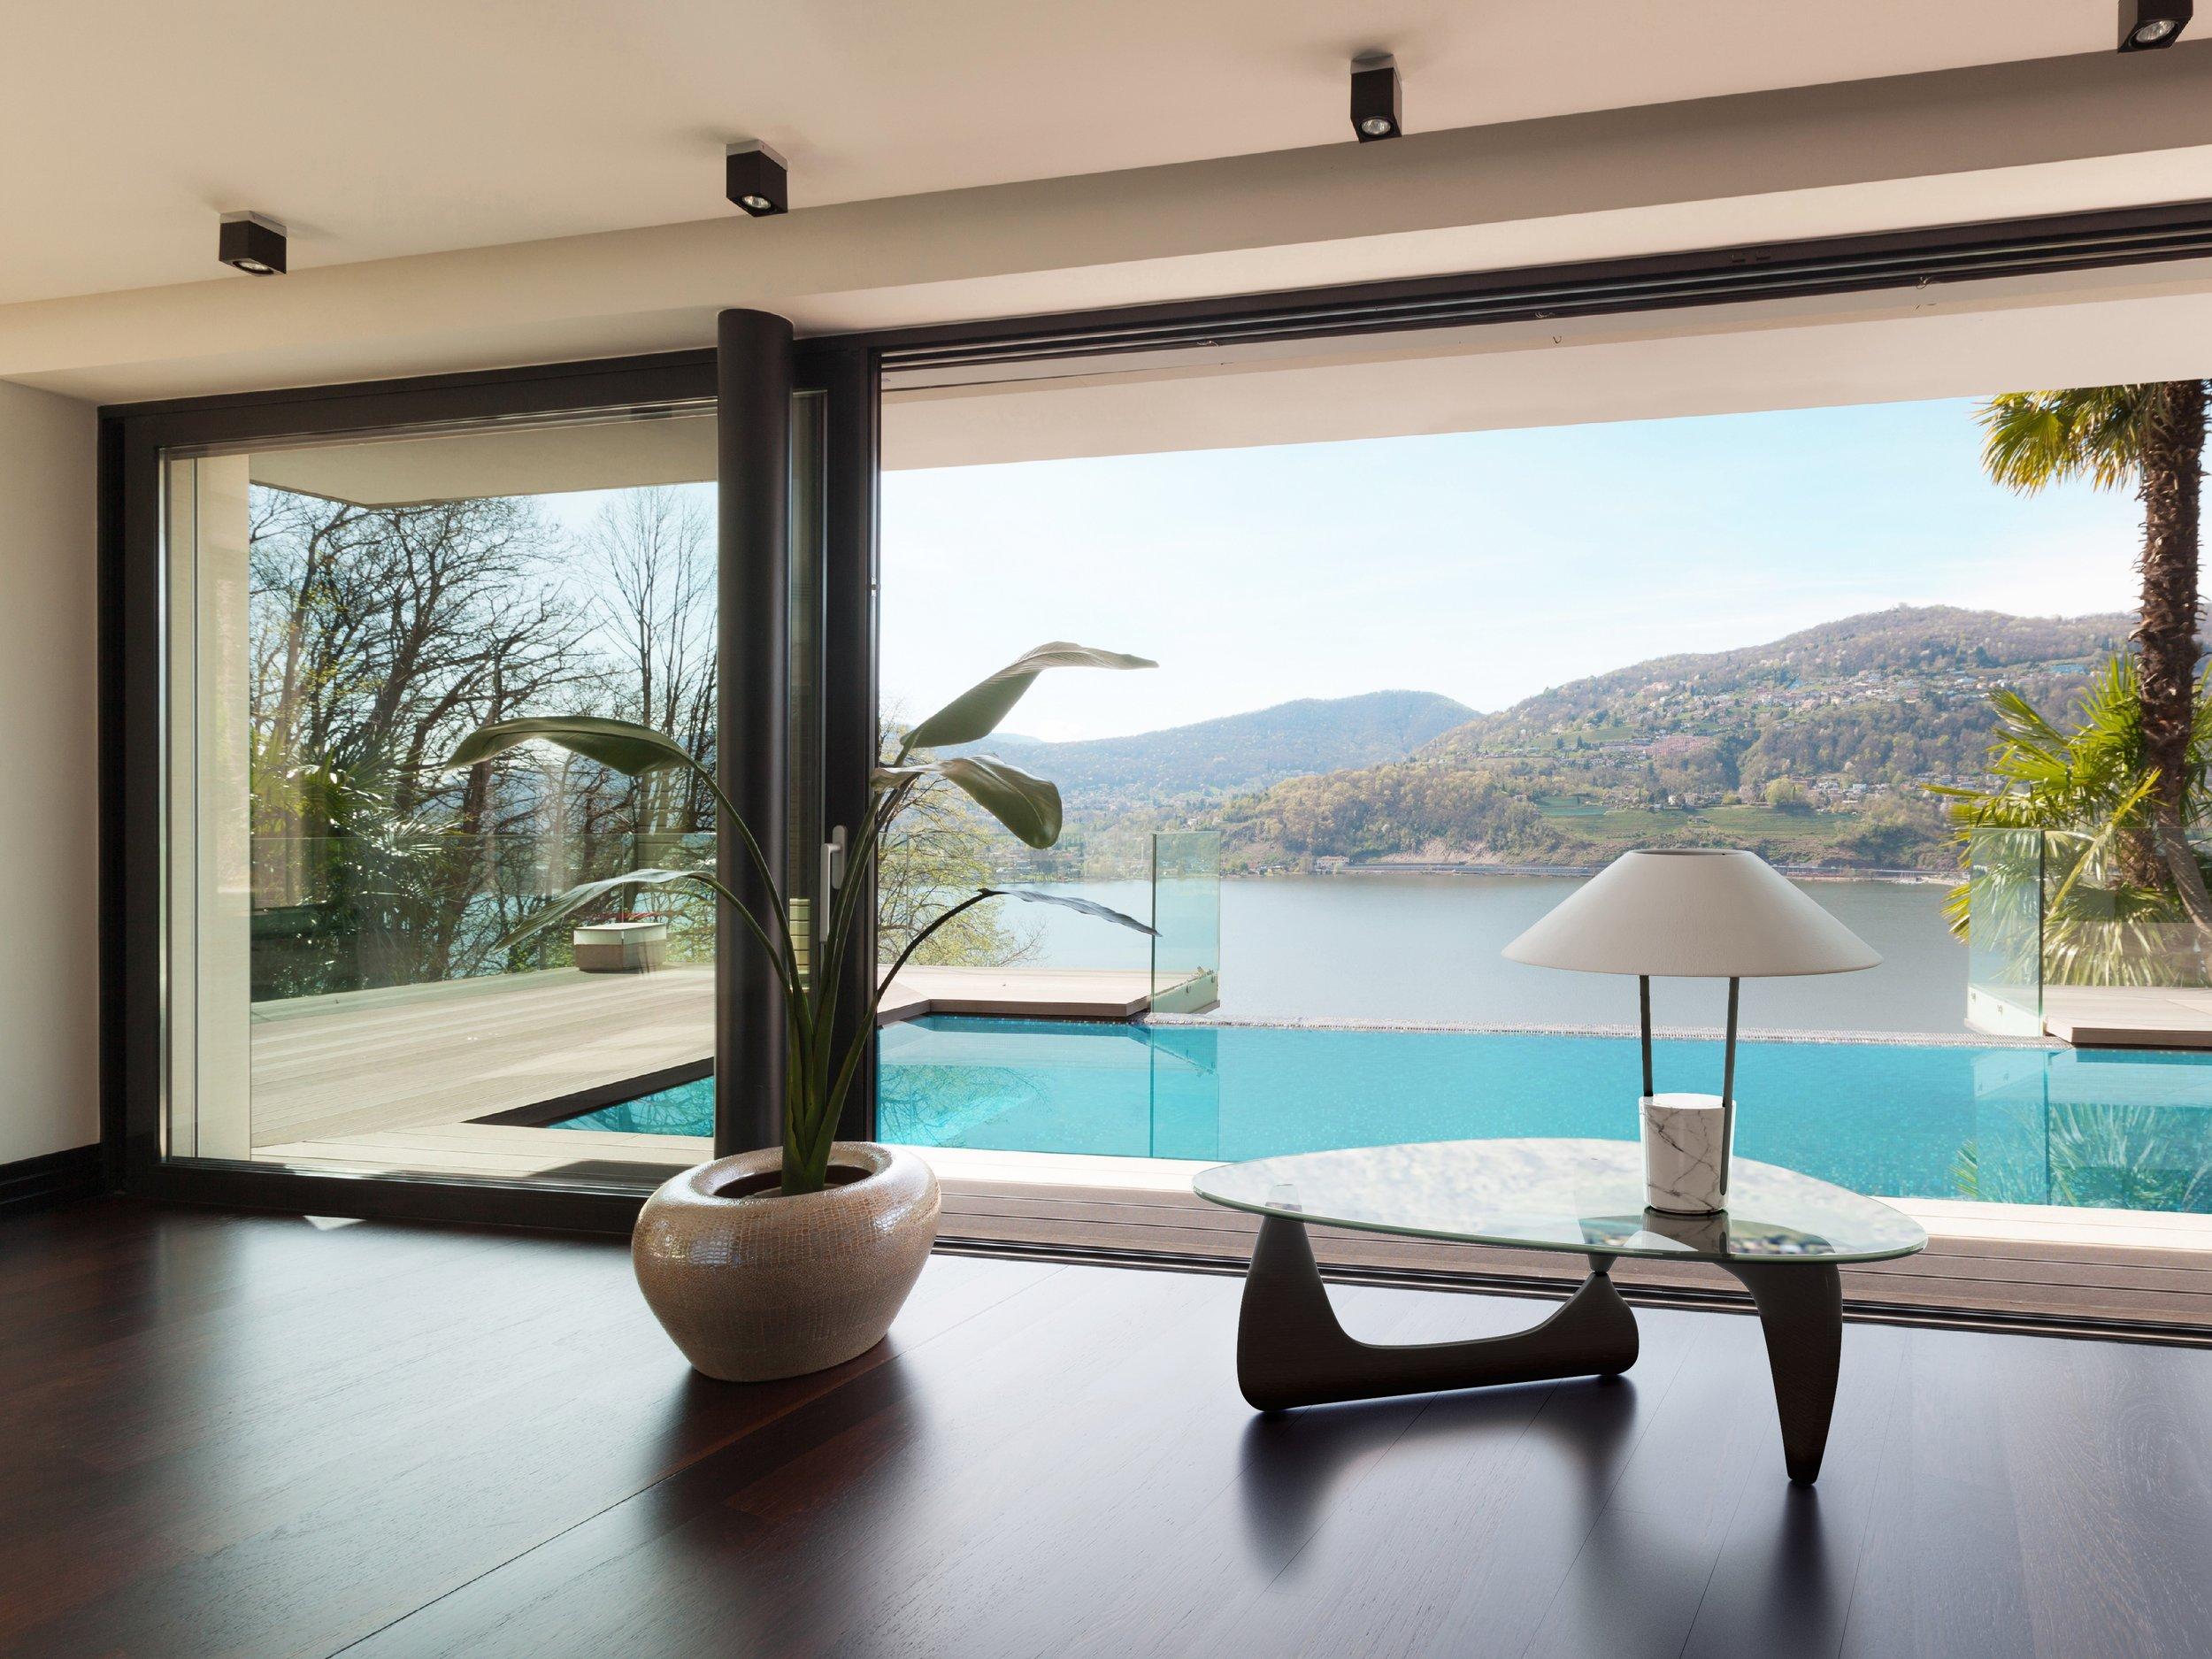 2017_10_28_INTEG_11_Pool_view_Living_room_table_Herman_Miller_Dusk_One_FINAL_4K.jpg